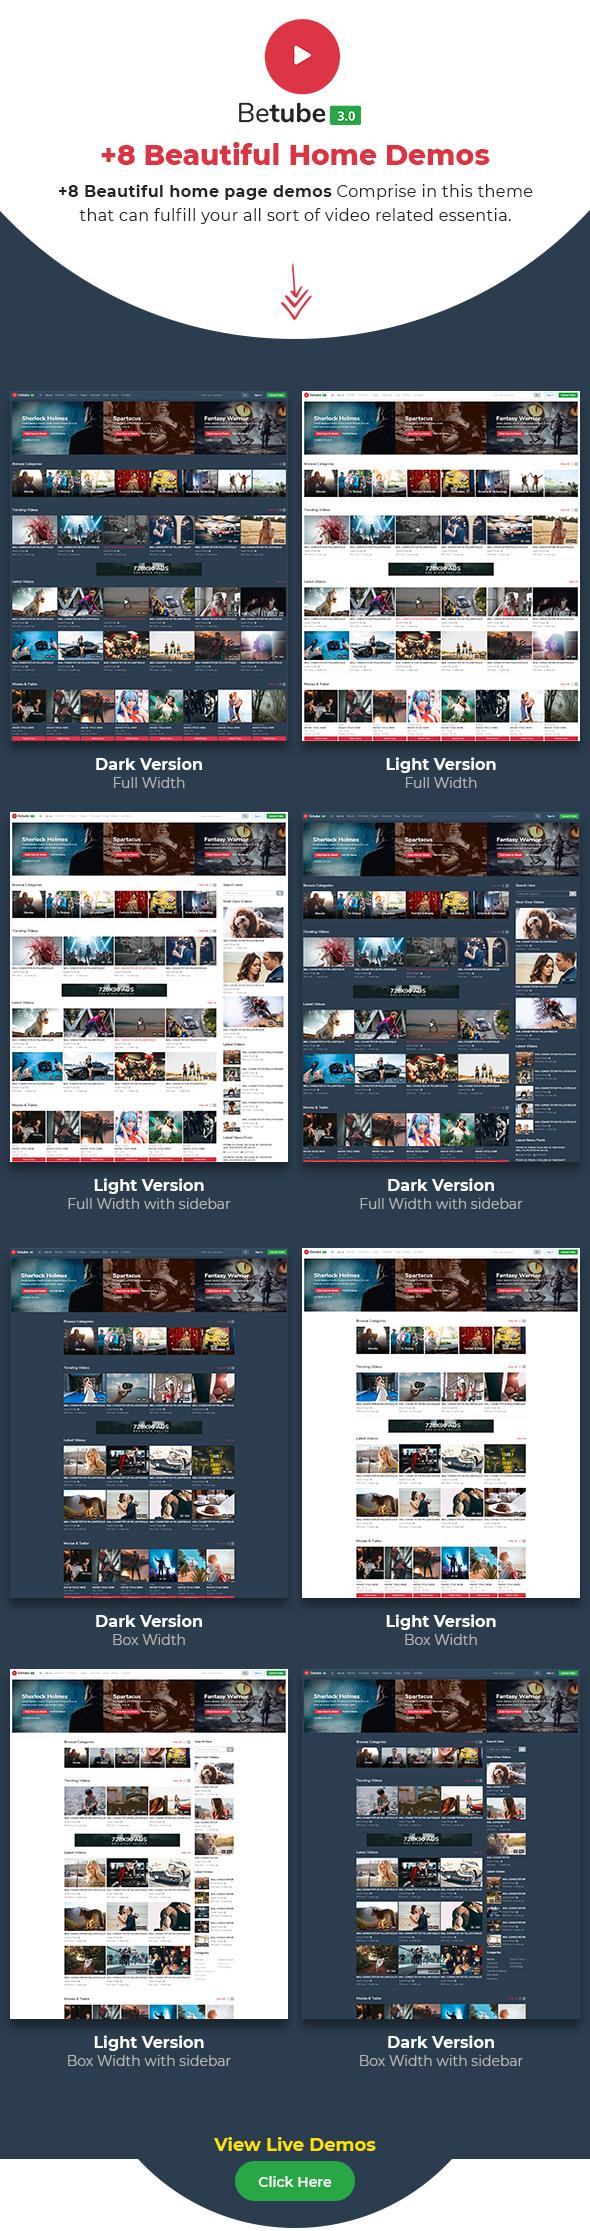 betube video WordPress theme demos